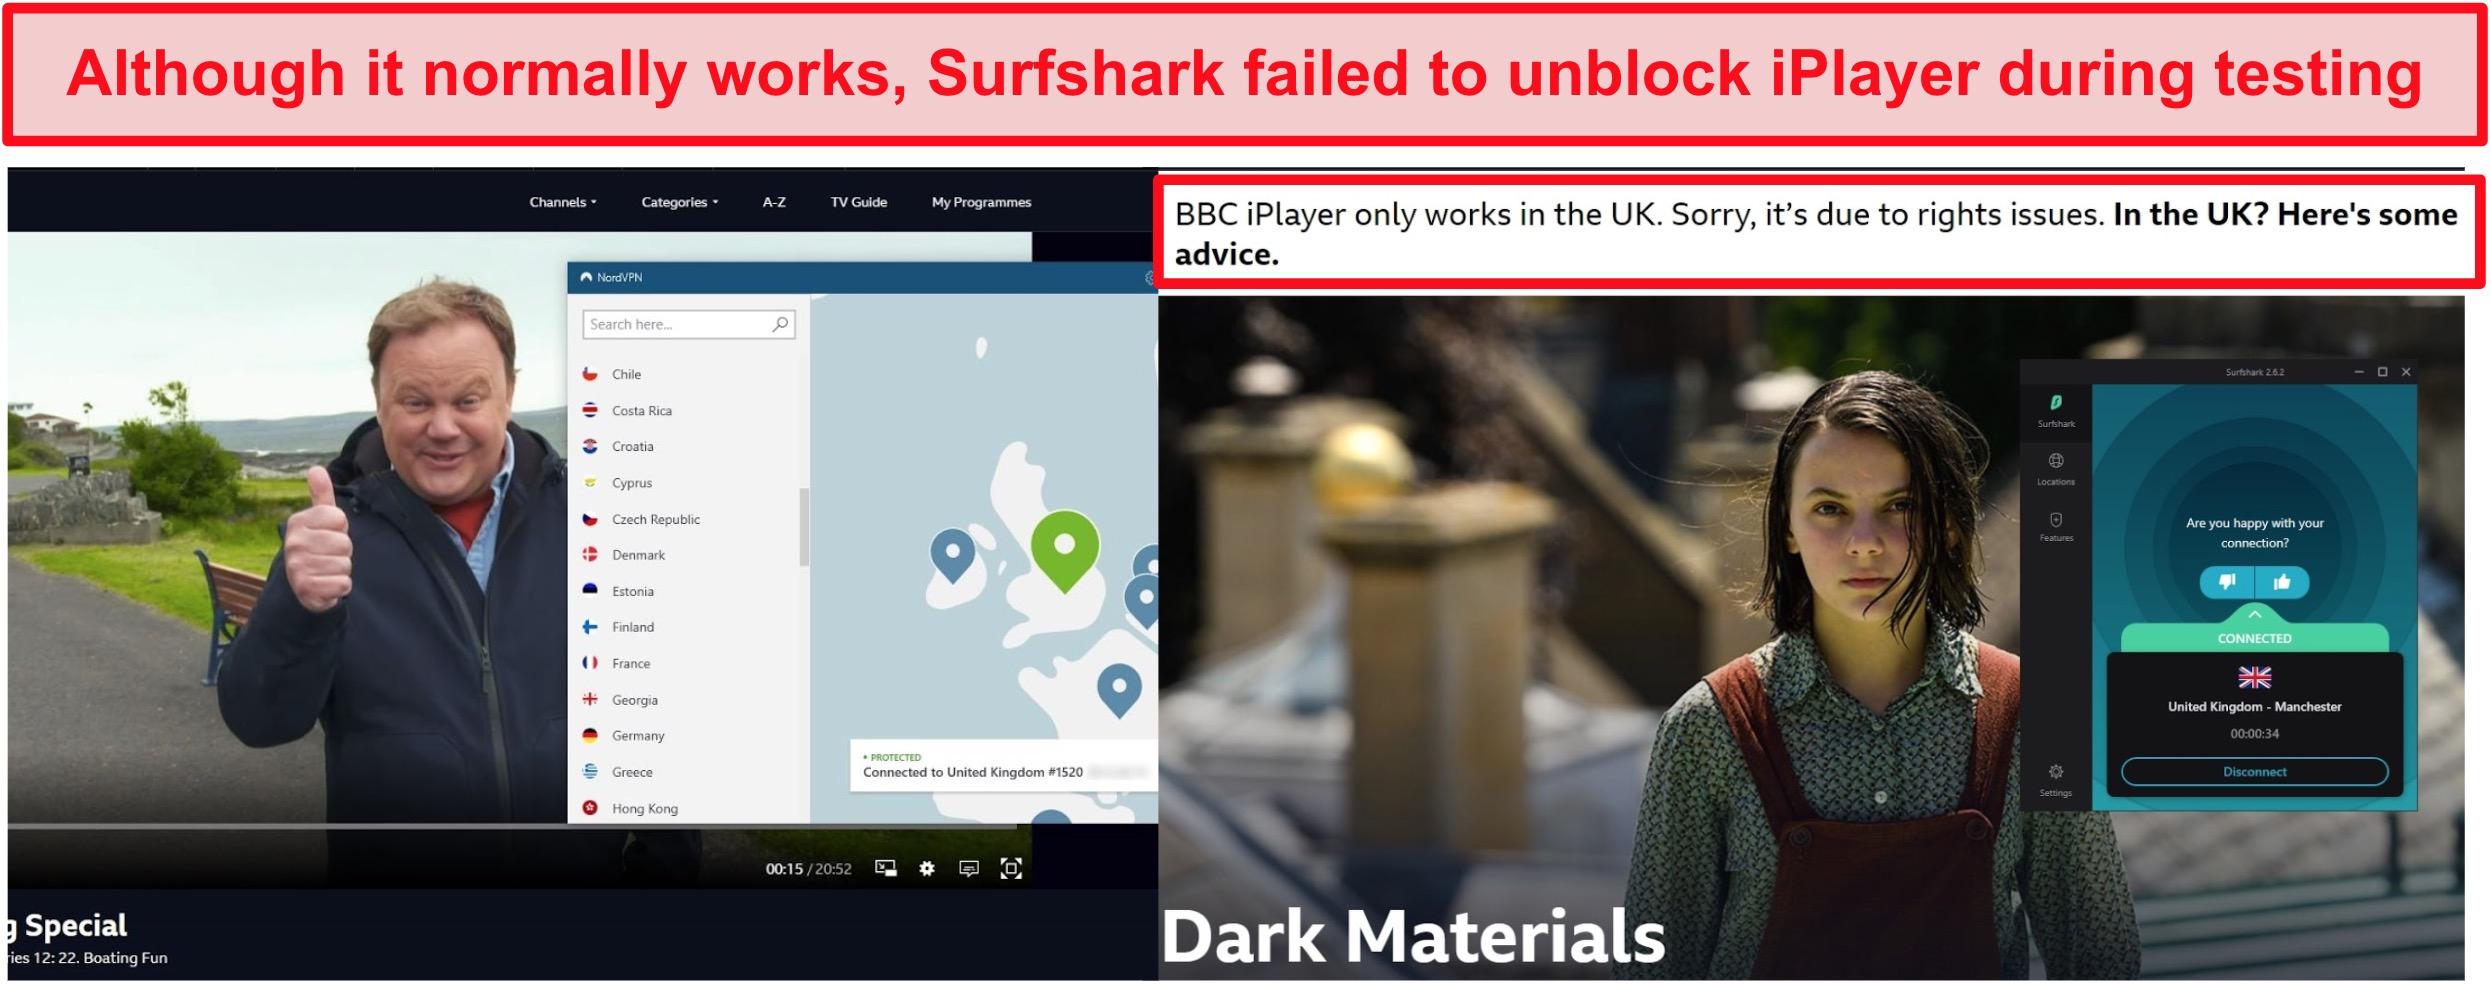 Screenshot of NordVPN successfully unblocking BBC iPlayer and Surfshark failing to do so.